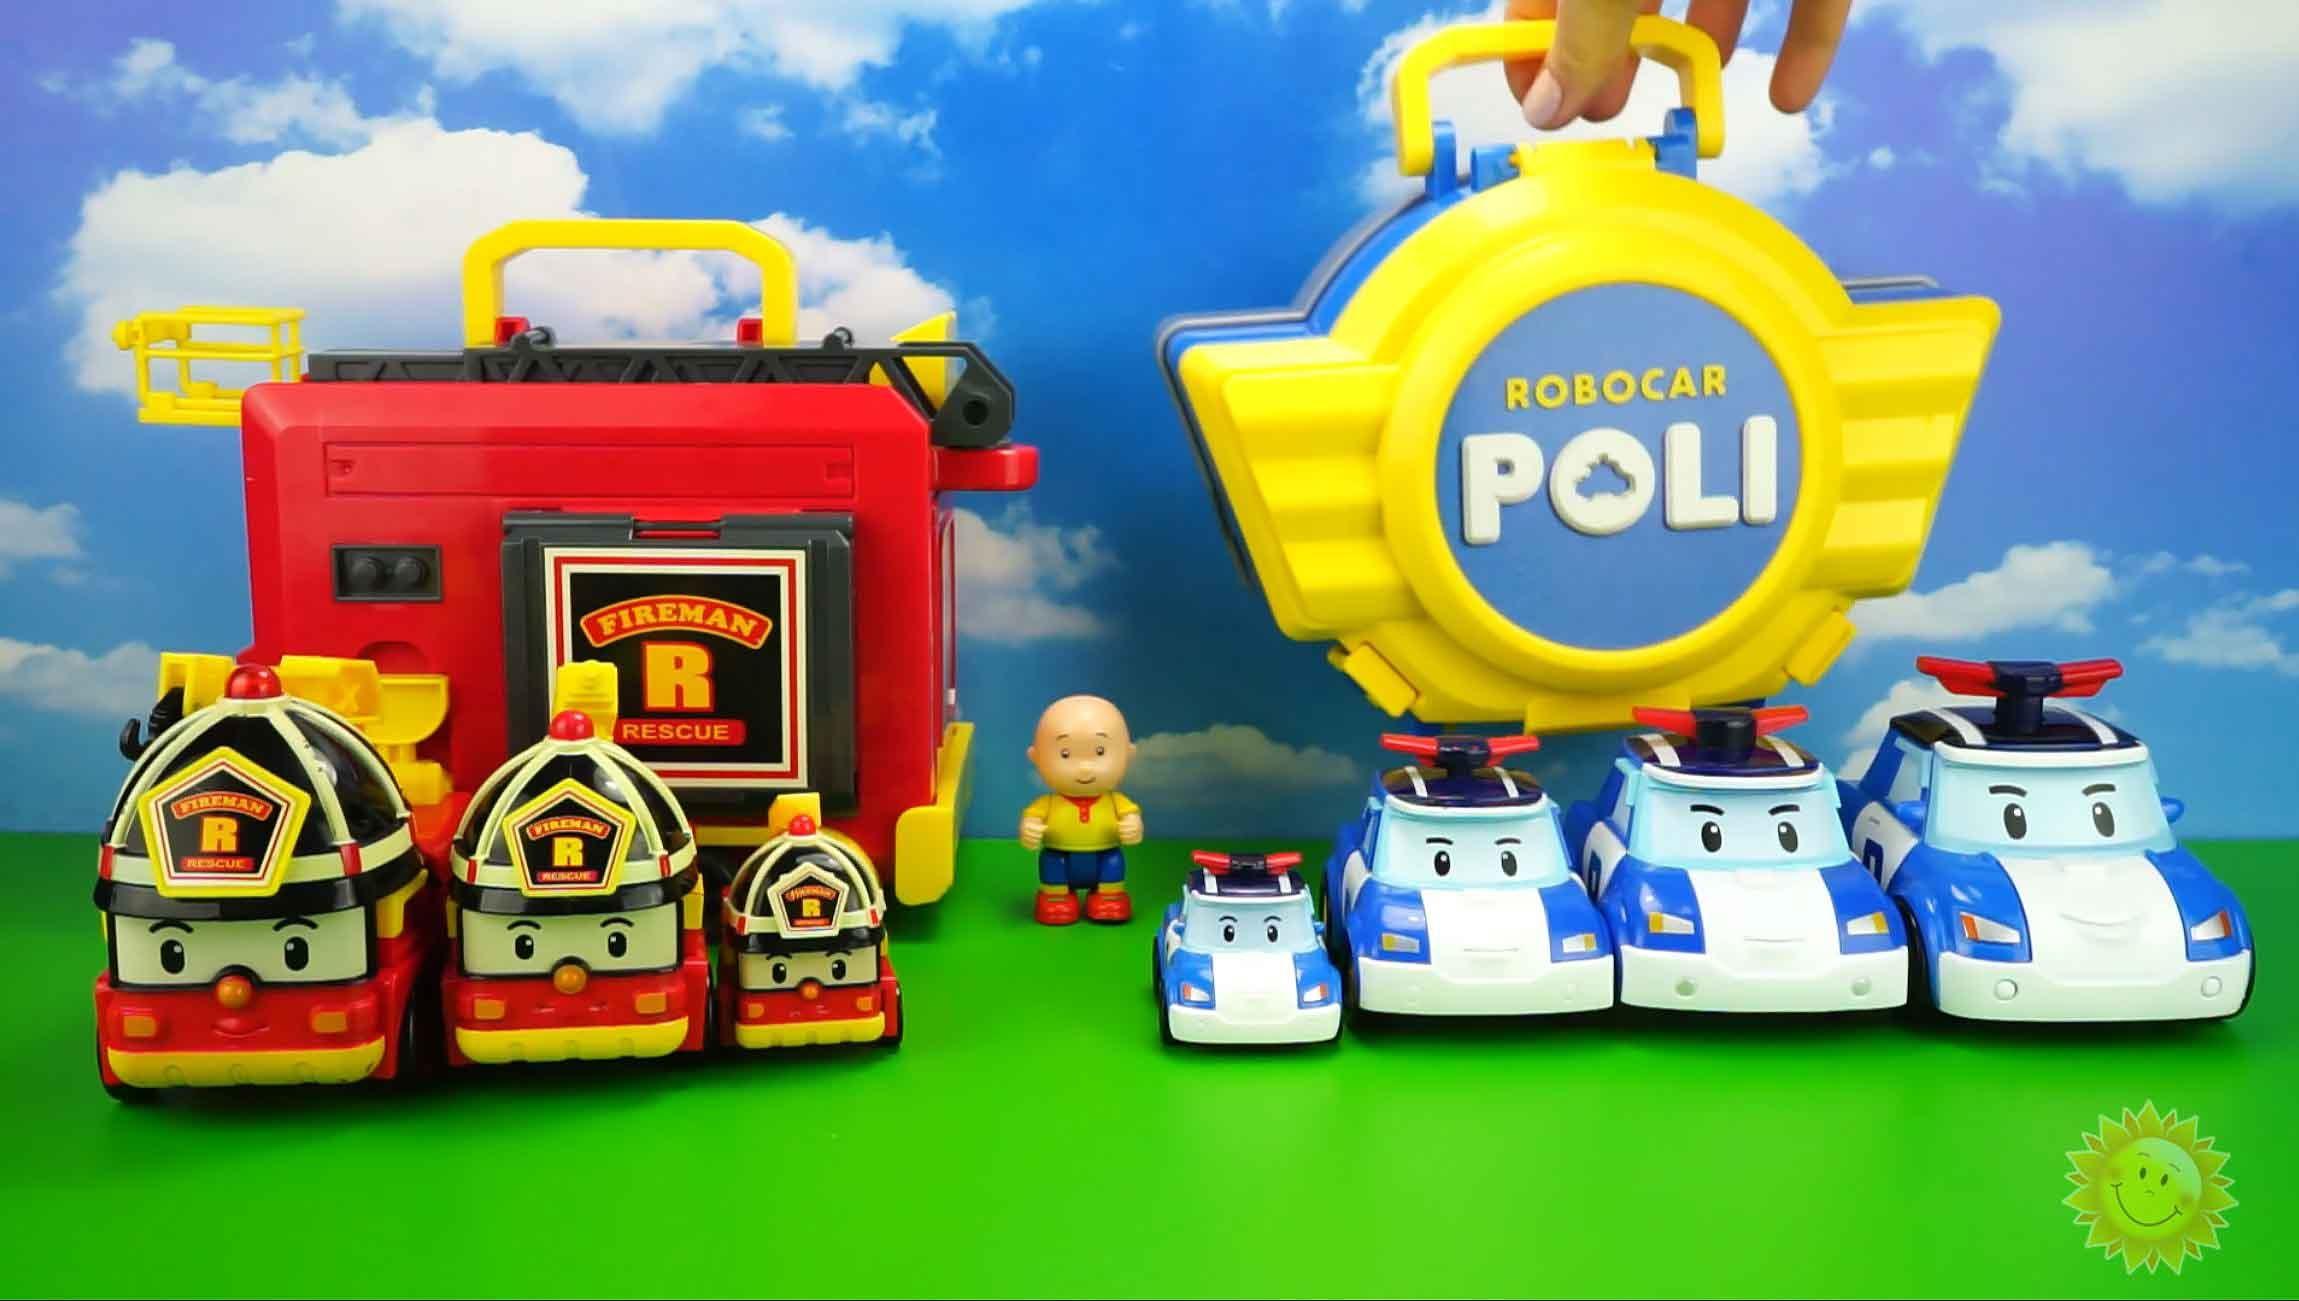 robot car polly jouet